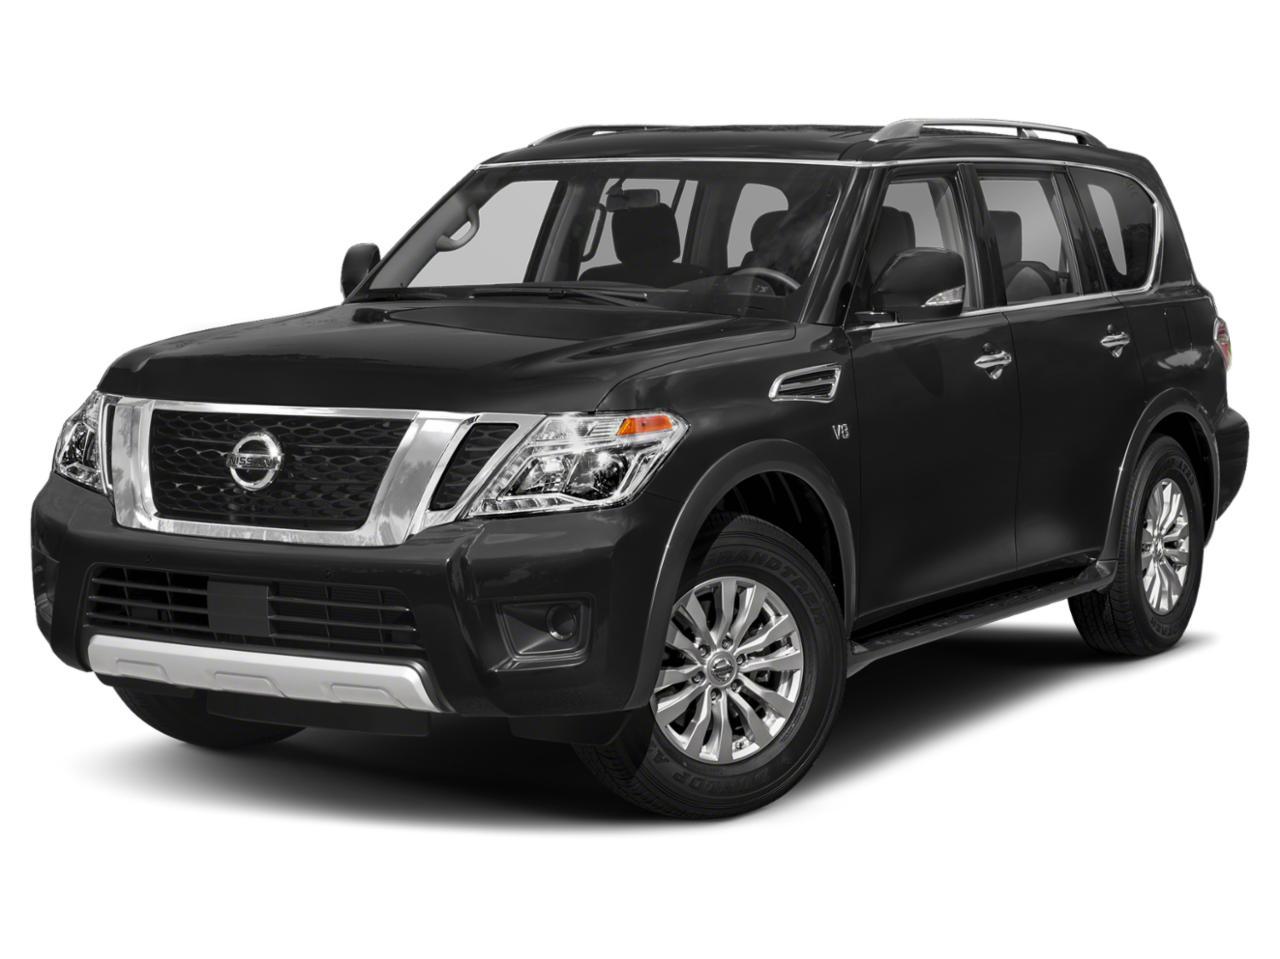 2019 Nissan Armada Vehicle Photo in Beaufort, SC 29906